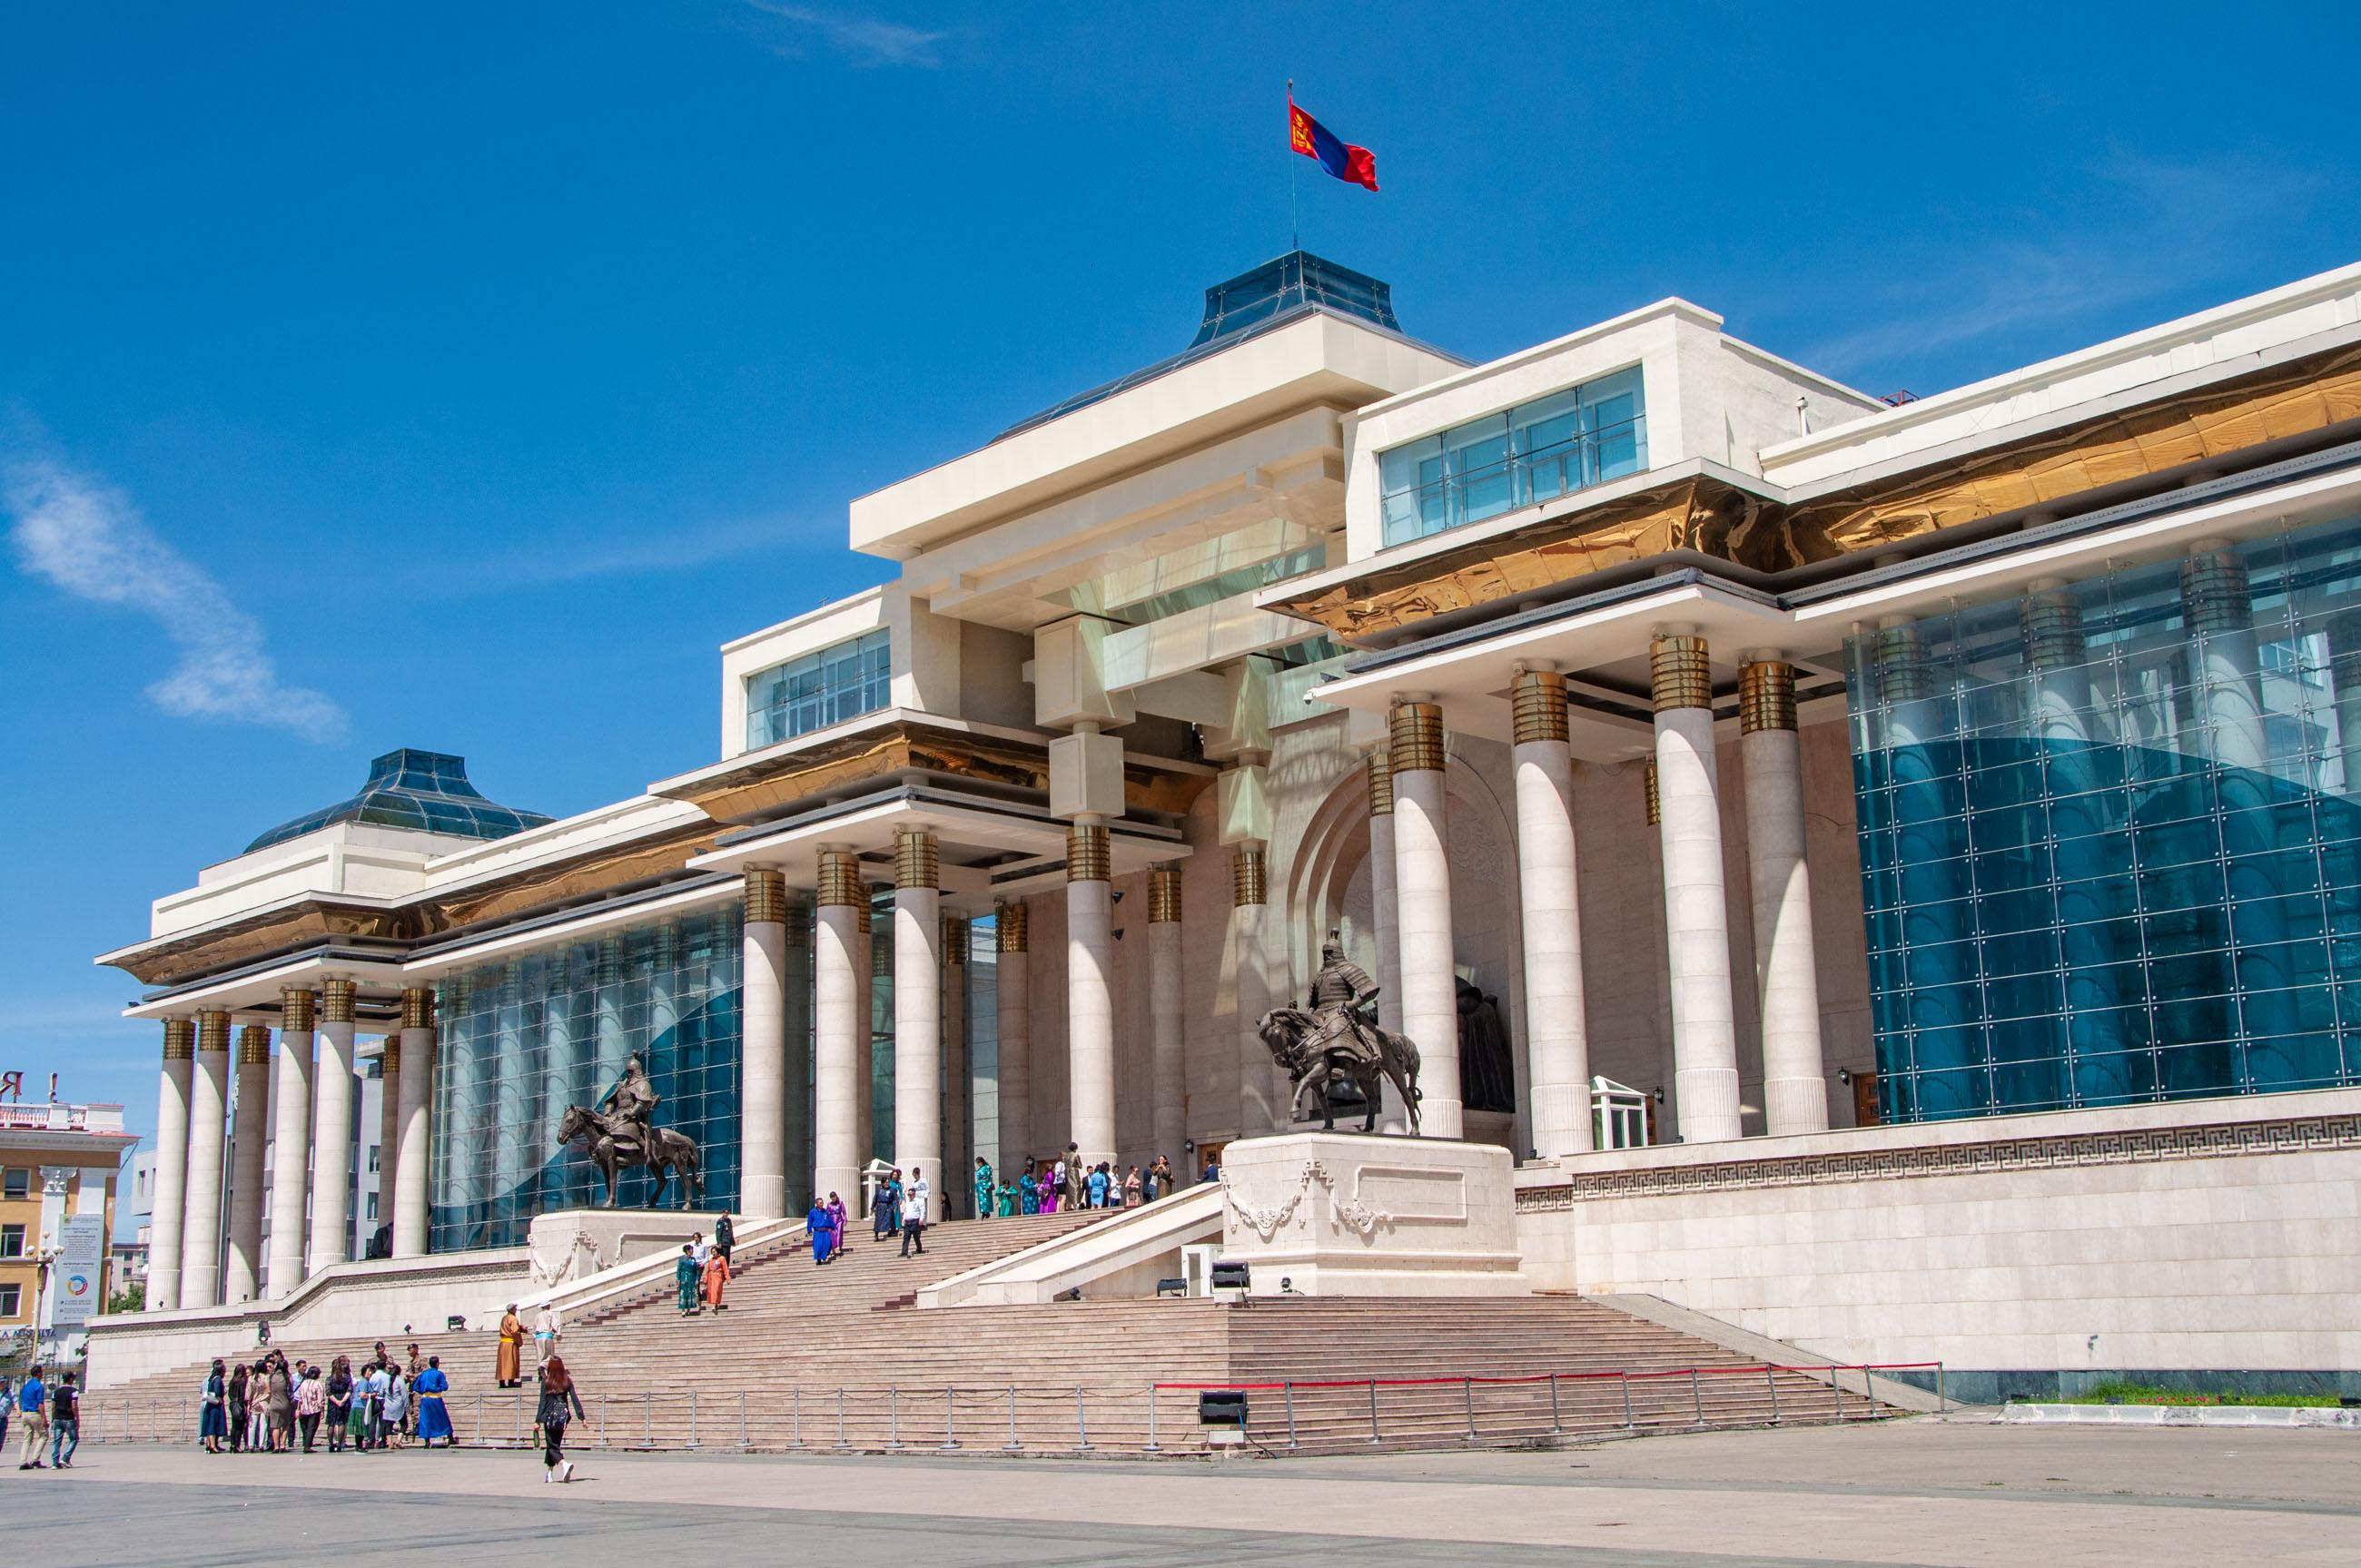 https://bubo.sk/uploads/galleries/4924/tomaskubus_mongolsko_ulanbatar_parlament_transsib.jpg